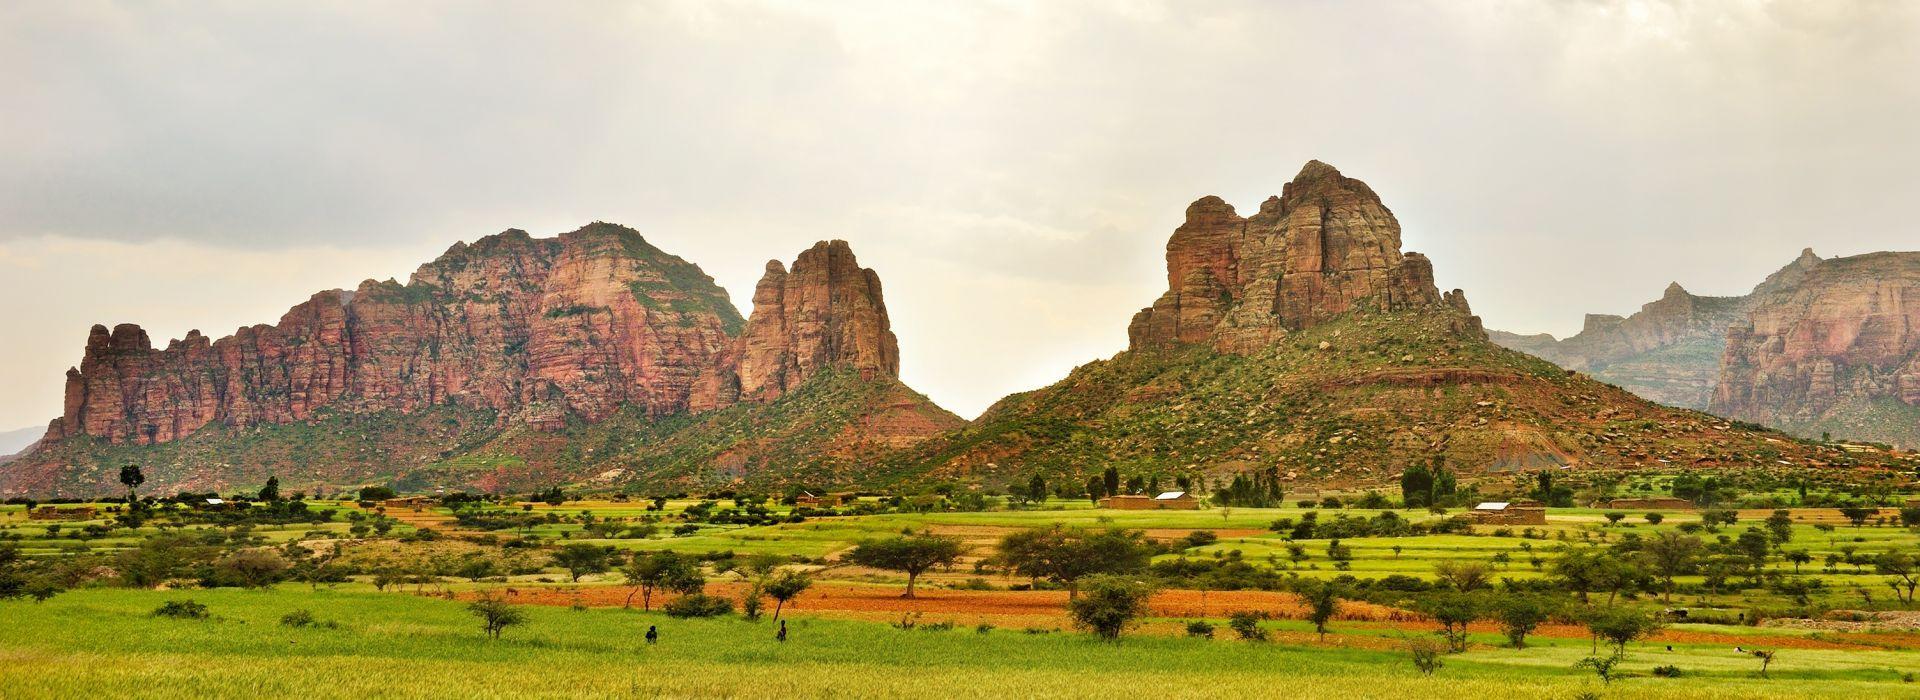 Adventure and sport Tours in Ethiopia